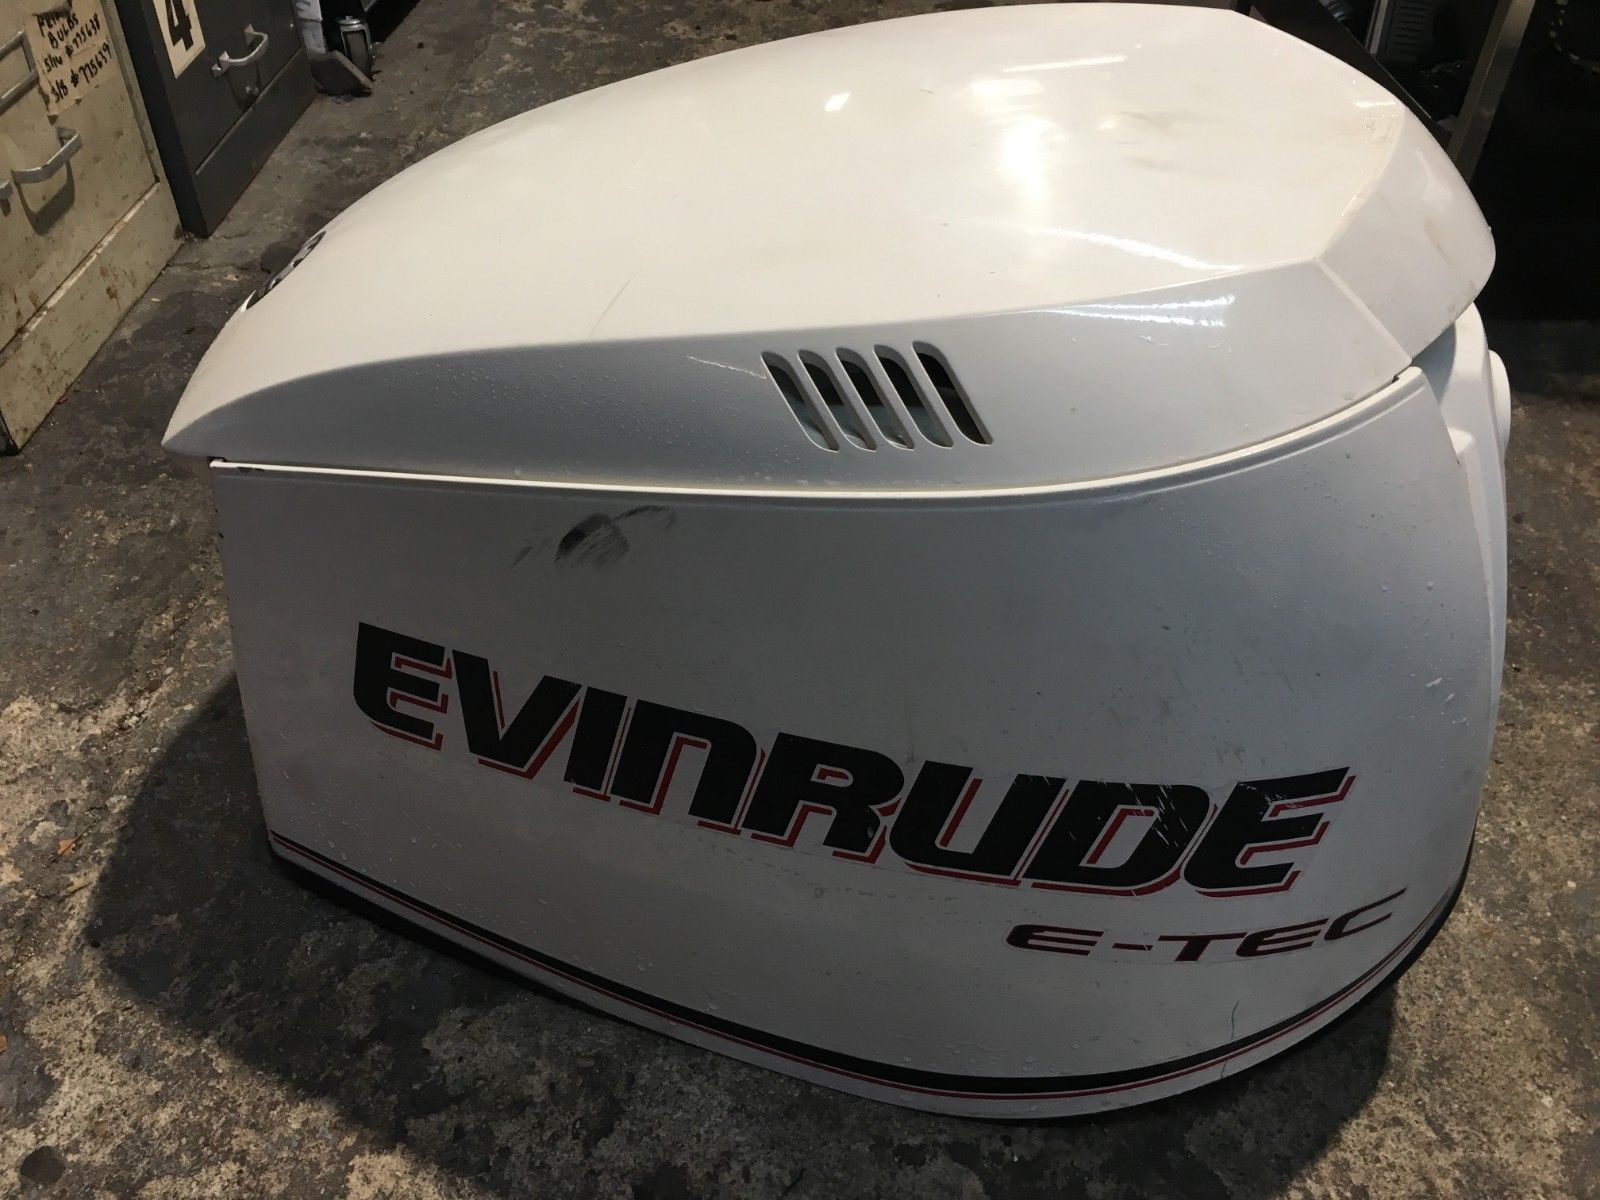 USED Evinrude Outboard ETEC Hood 200-250HP White 285653 Cover E-TEC